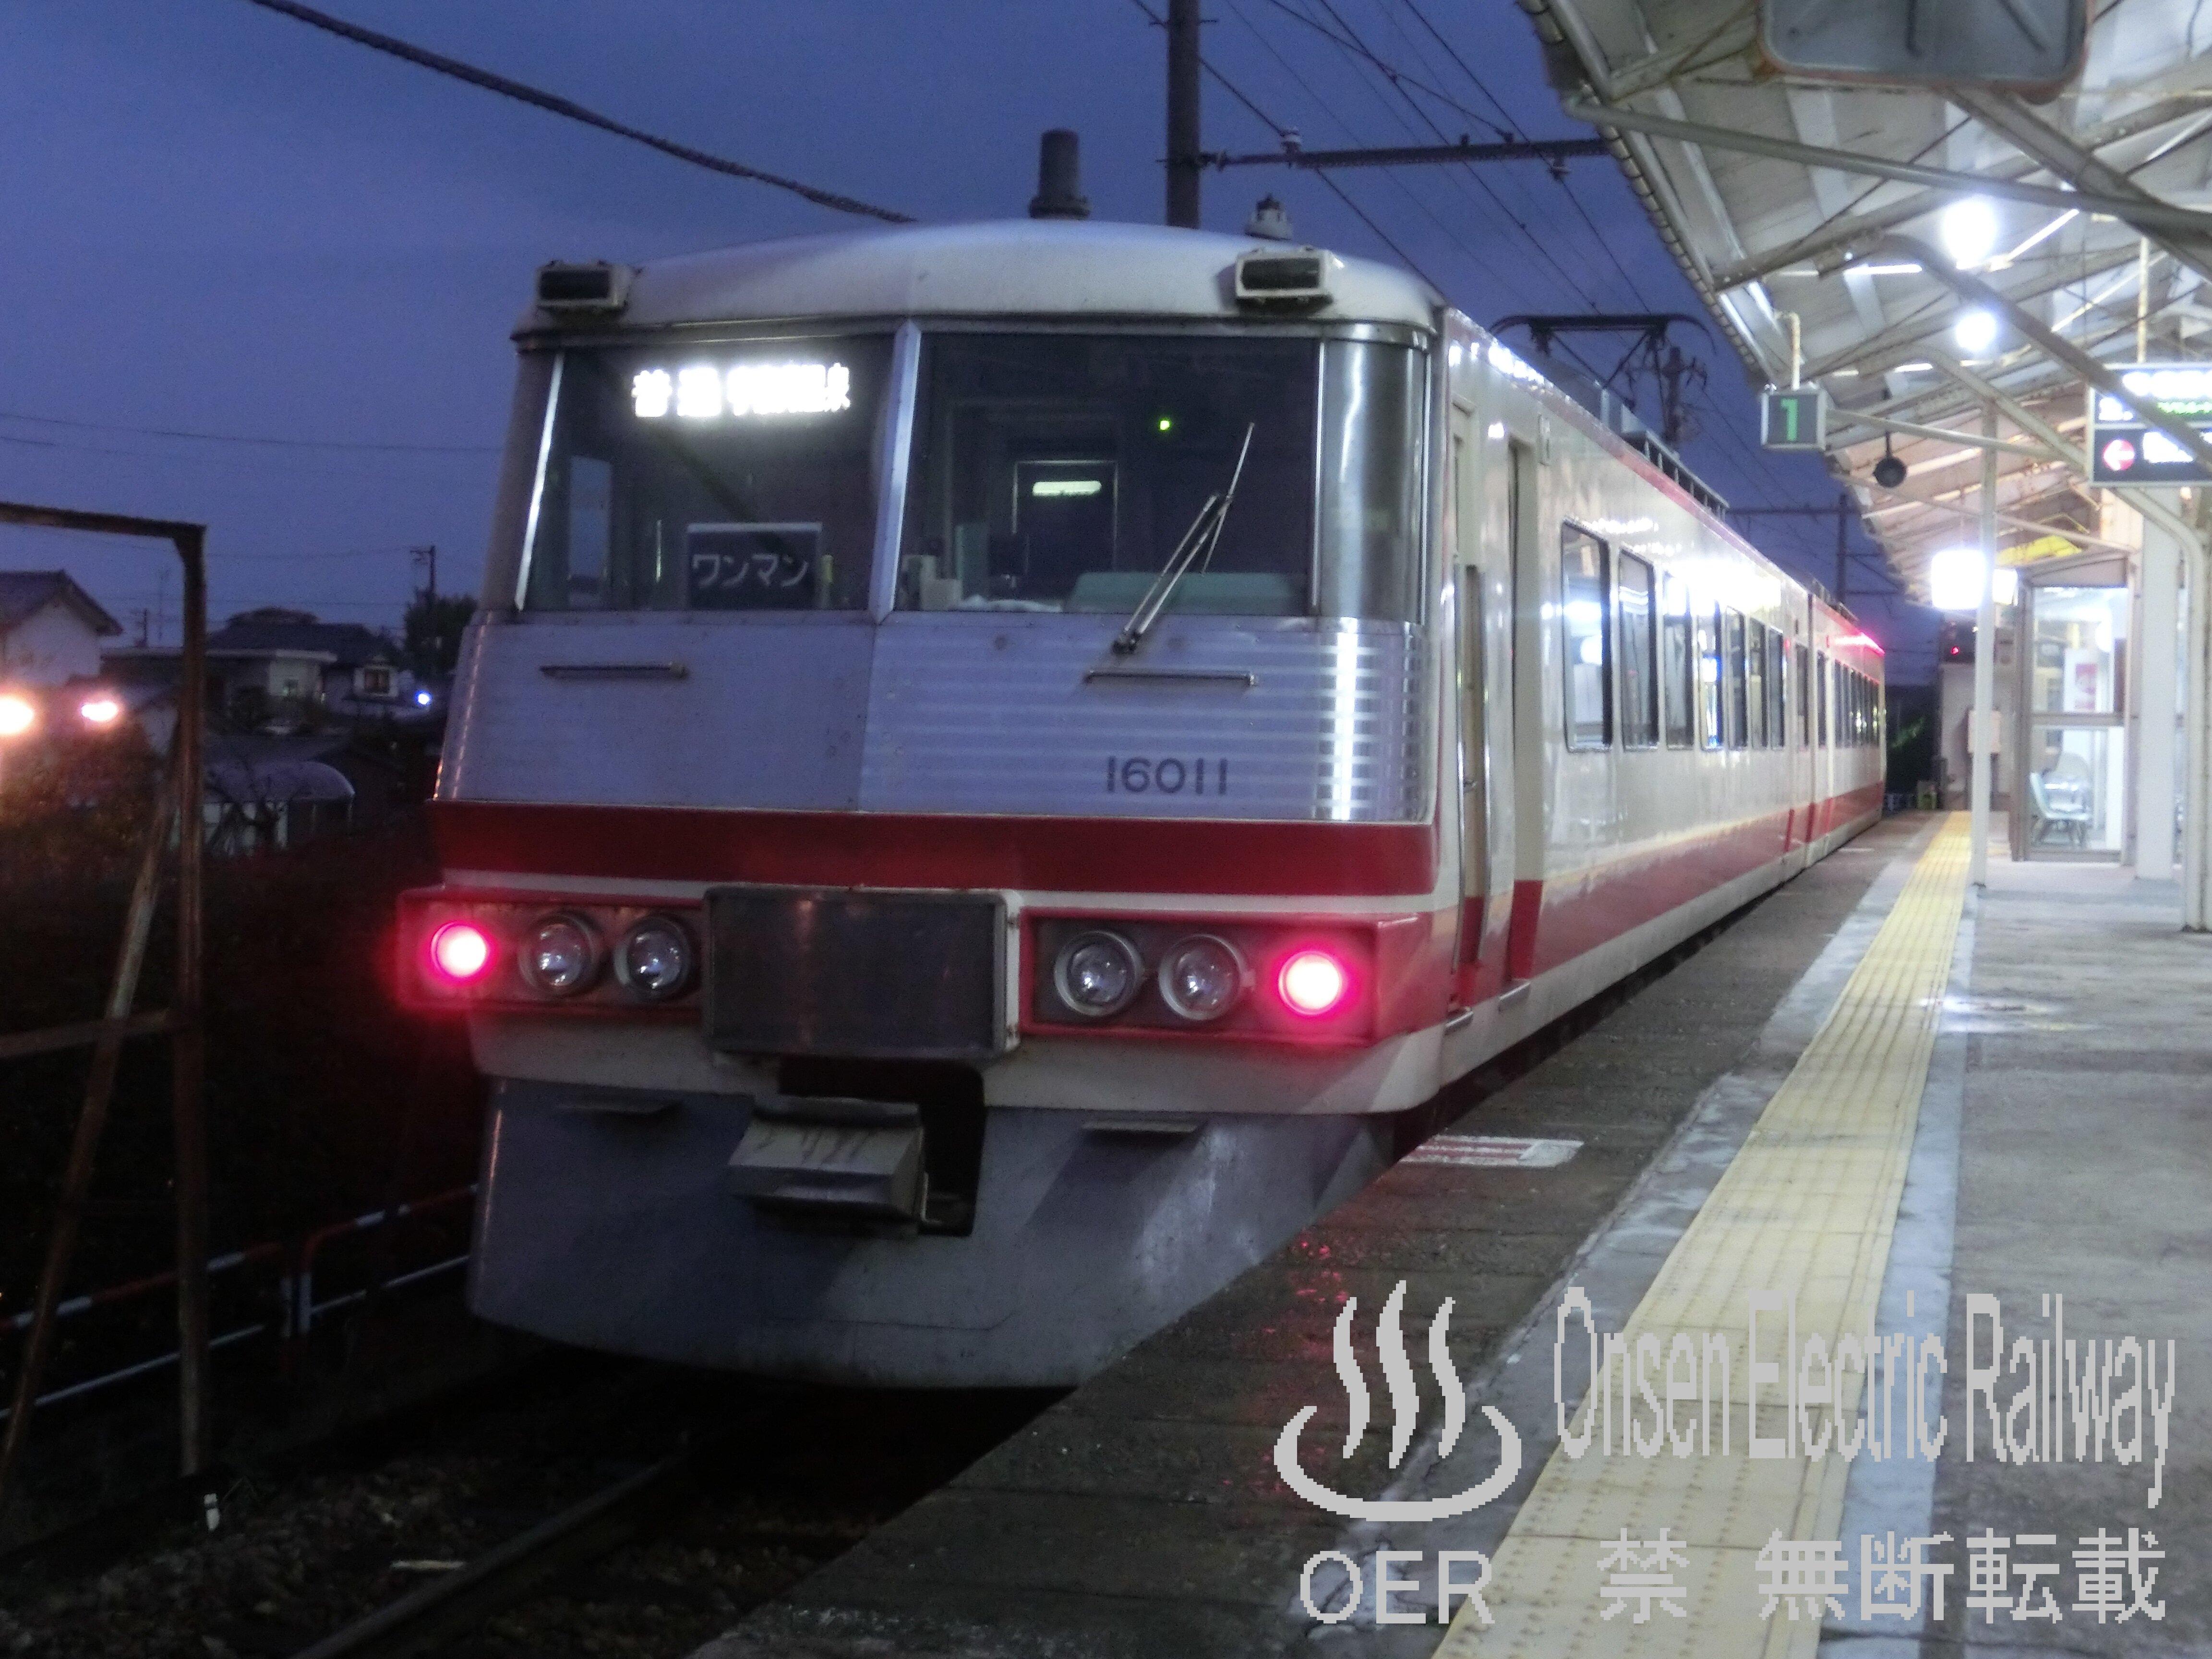 03_chitetsu_16011f.jpg